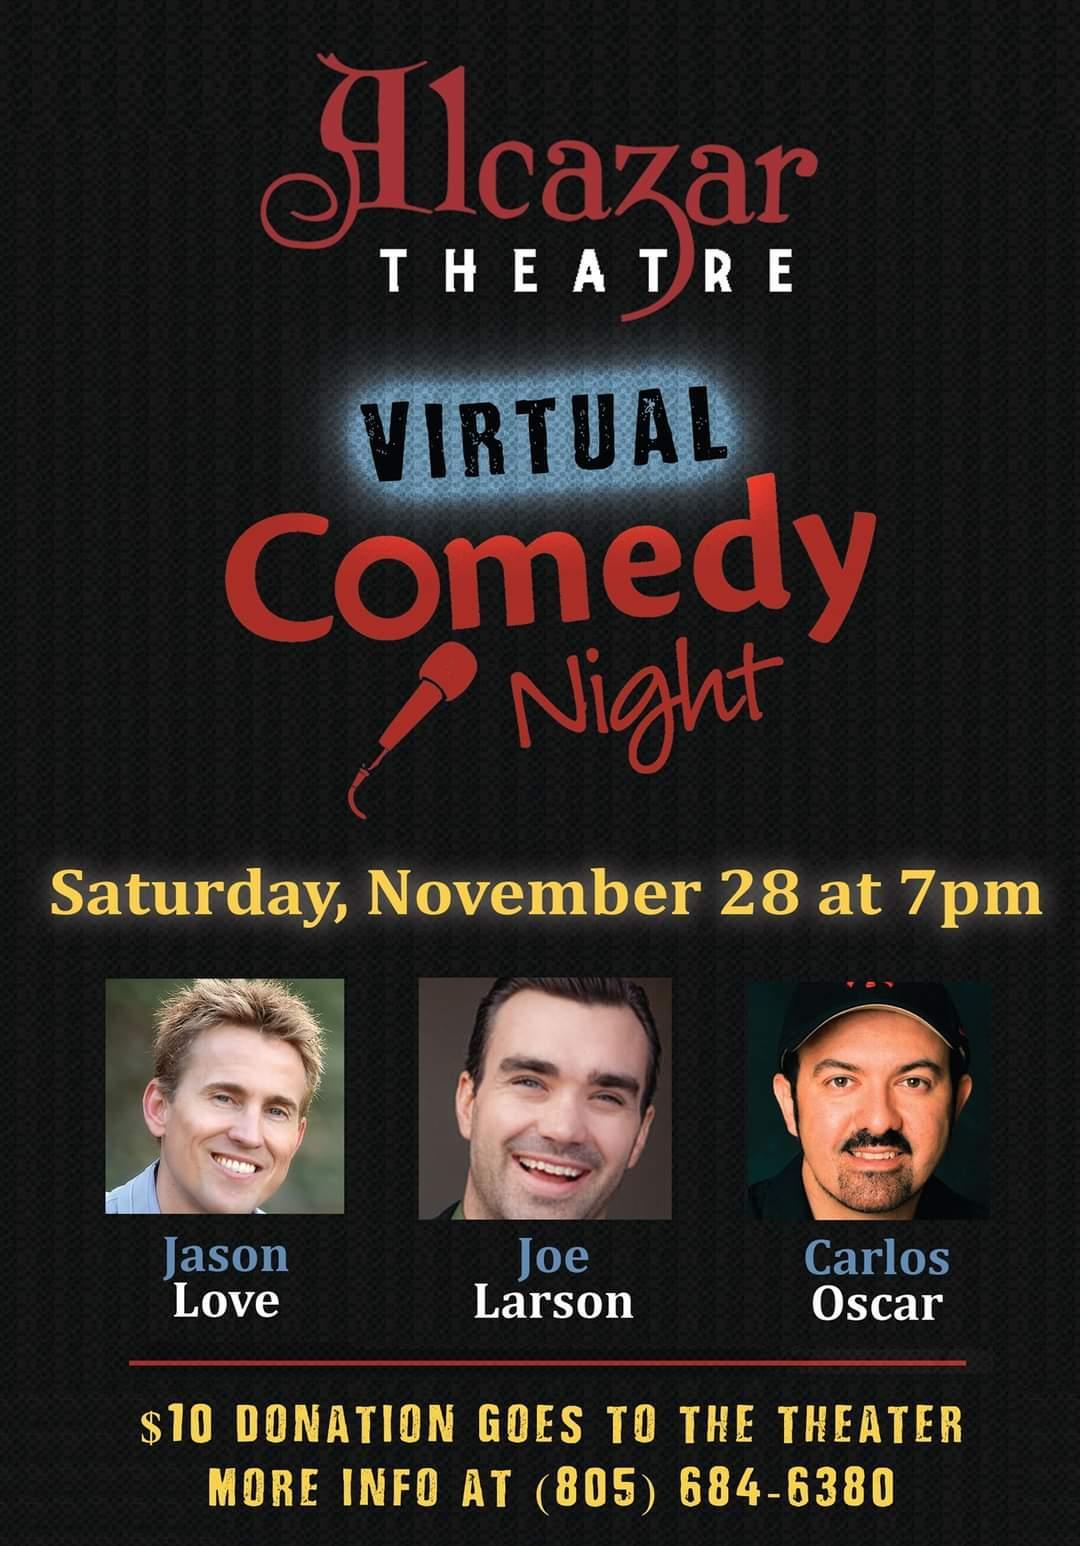 Virtual Comedy Night